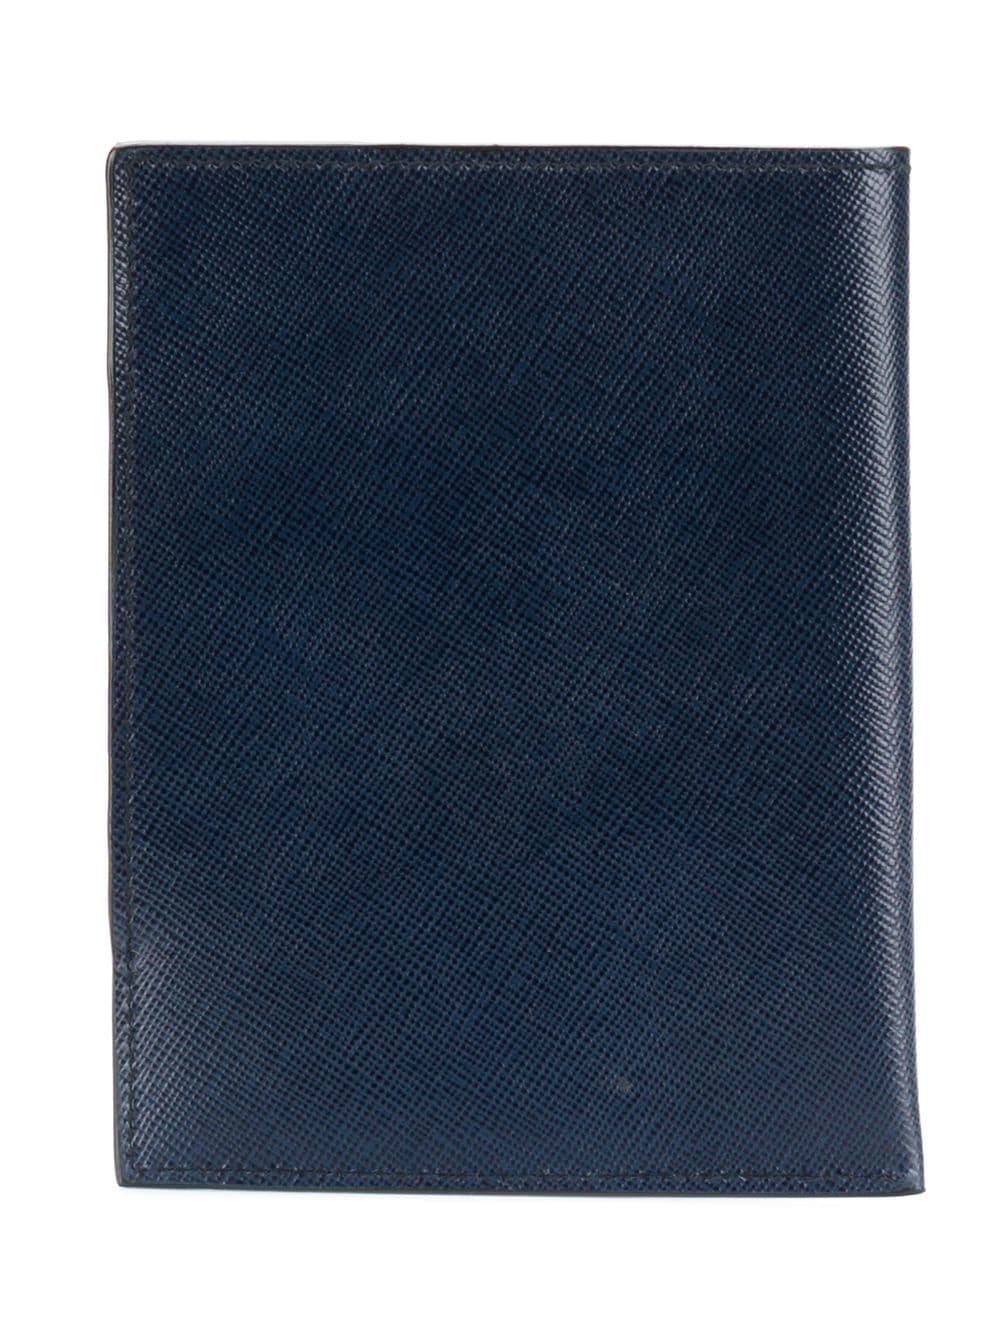 9542abd5a3f02 Prada Snap Fastening Wallet in Blue for Men - Lyst